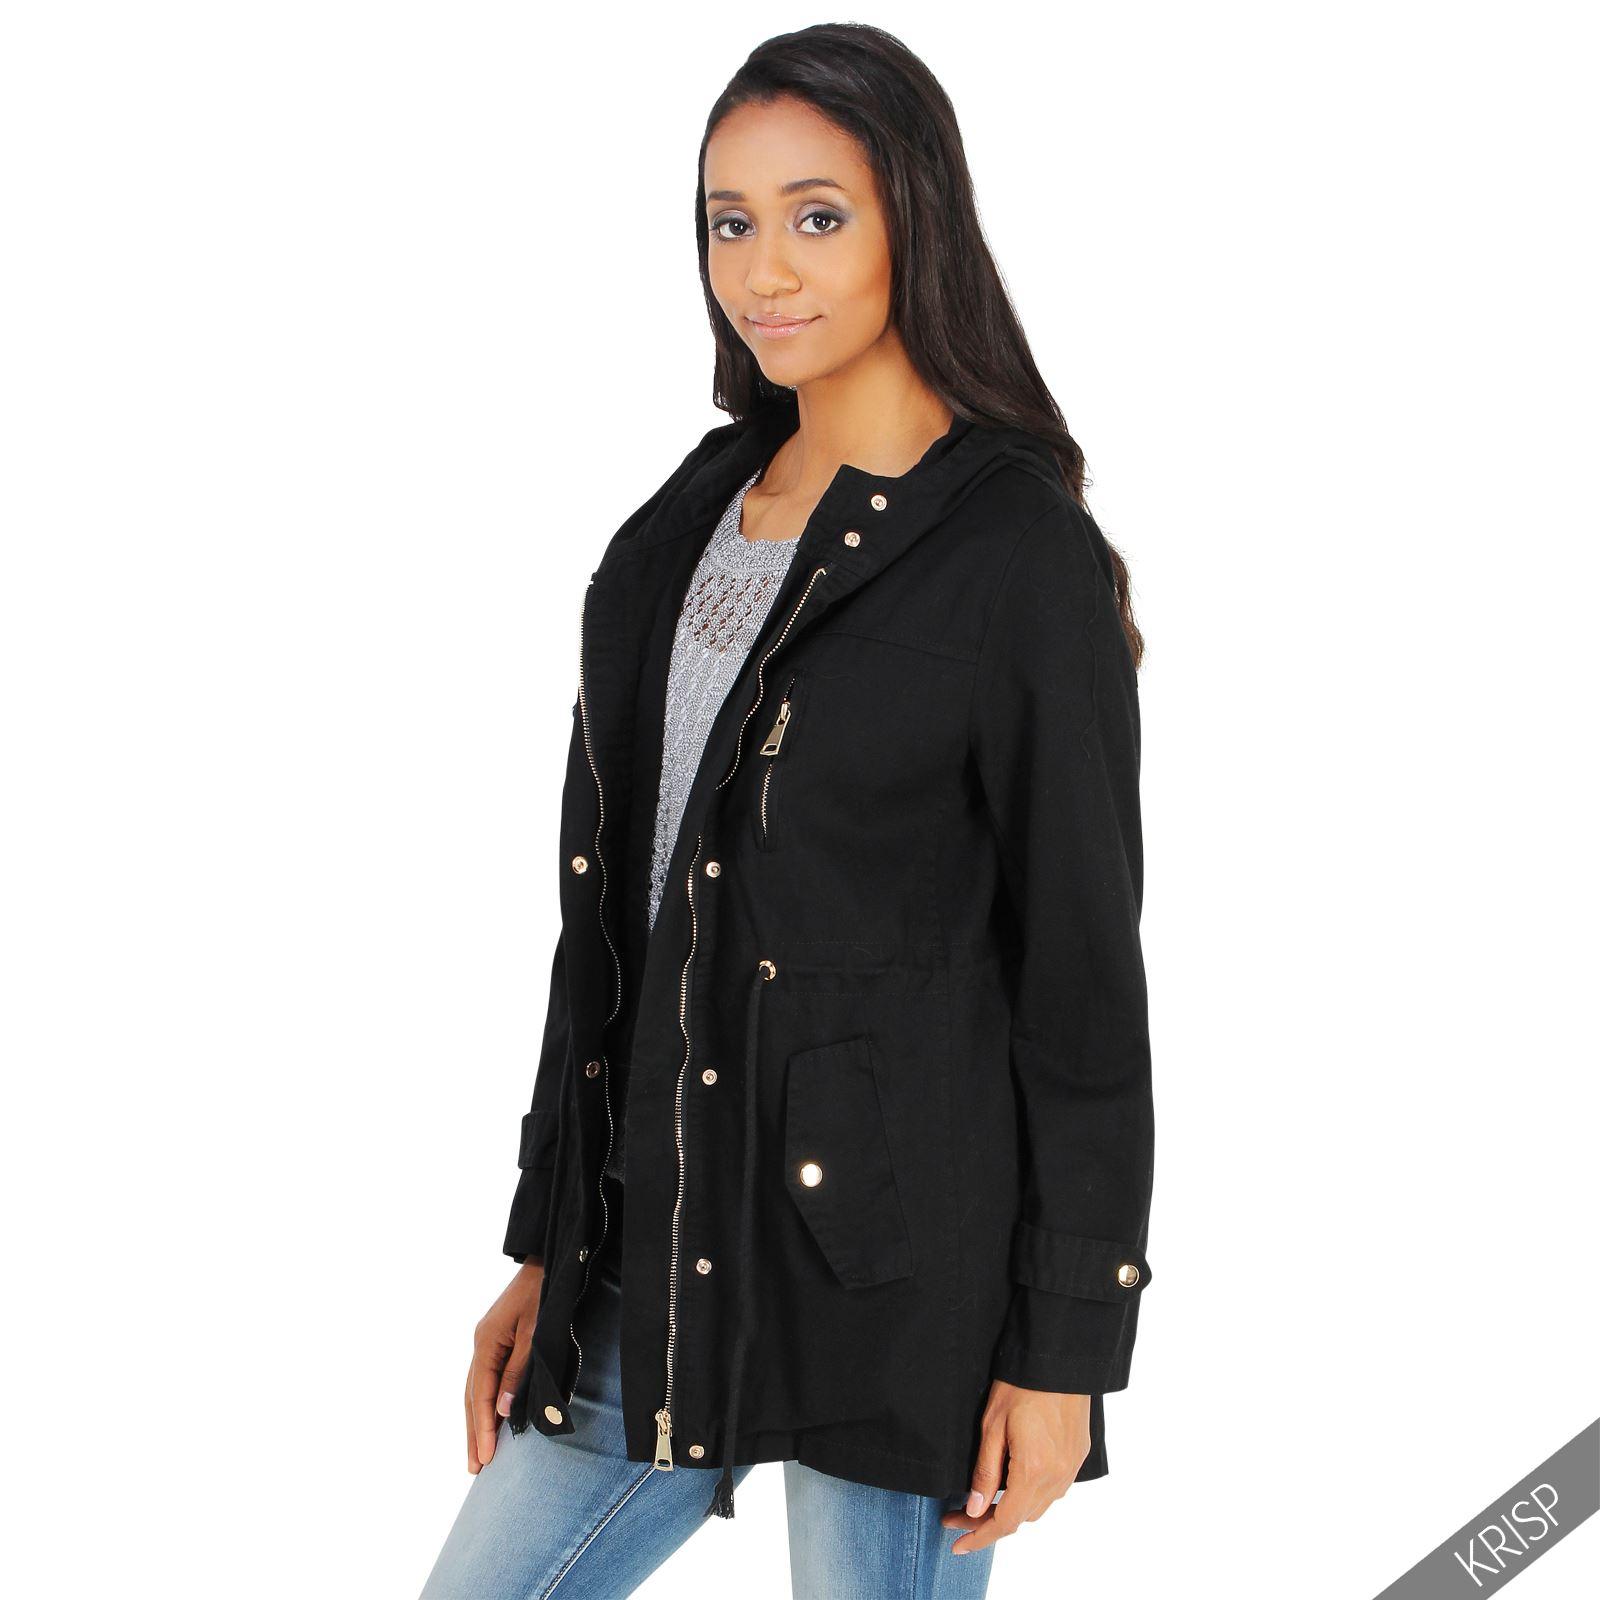 Womens Ladies Classic Hooded Parka Jacket Long Coat Fishtail Raincoat Trench Mac